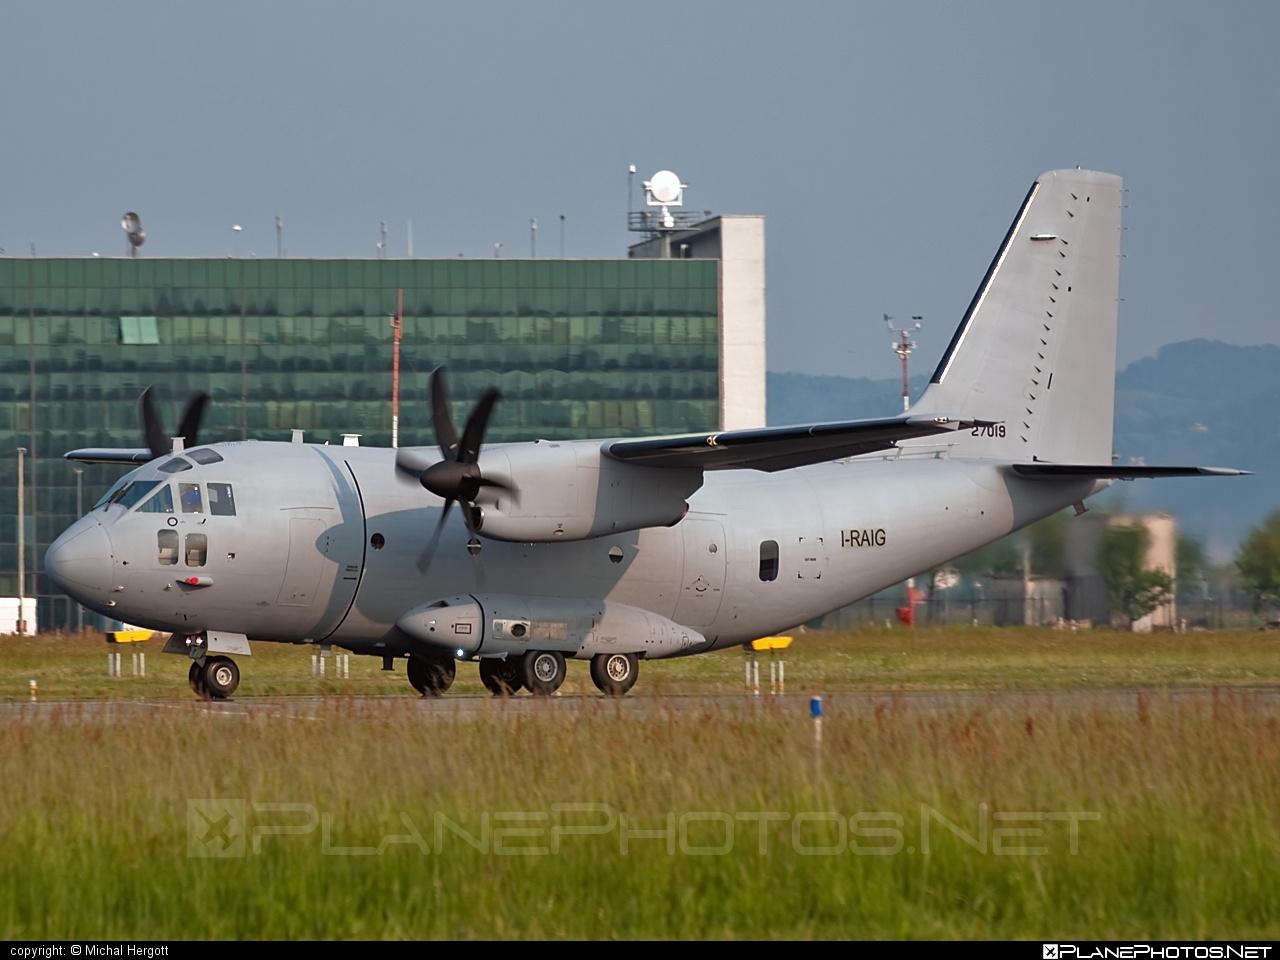 Alenia C-27J Spartan - I-RAIG operated by Alenia Aeronautica #alenia #aleniac27j #aleniac27jspartan #aleniaspartan #c27j #c27jspartan #c27spartan